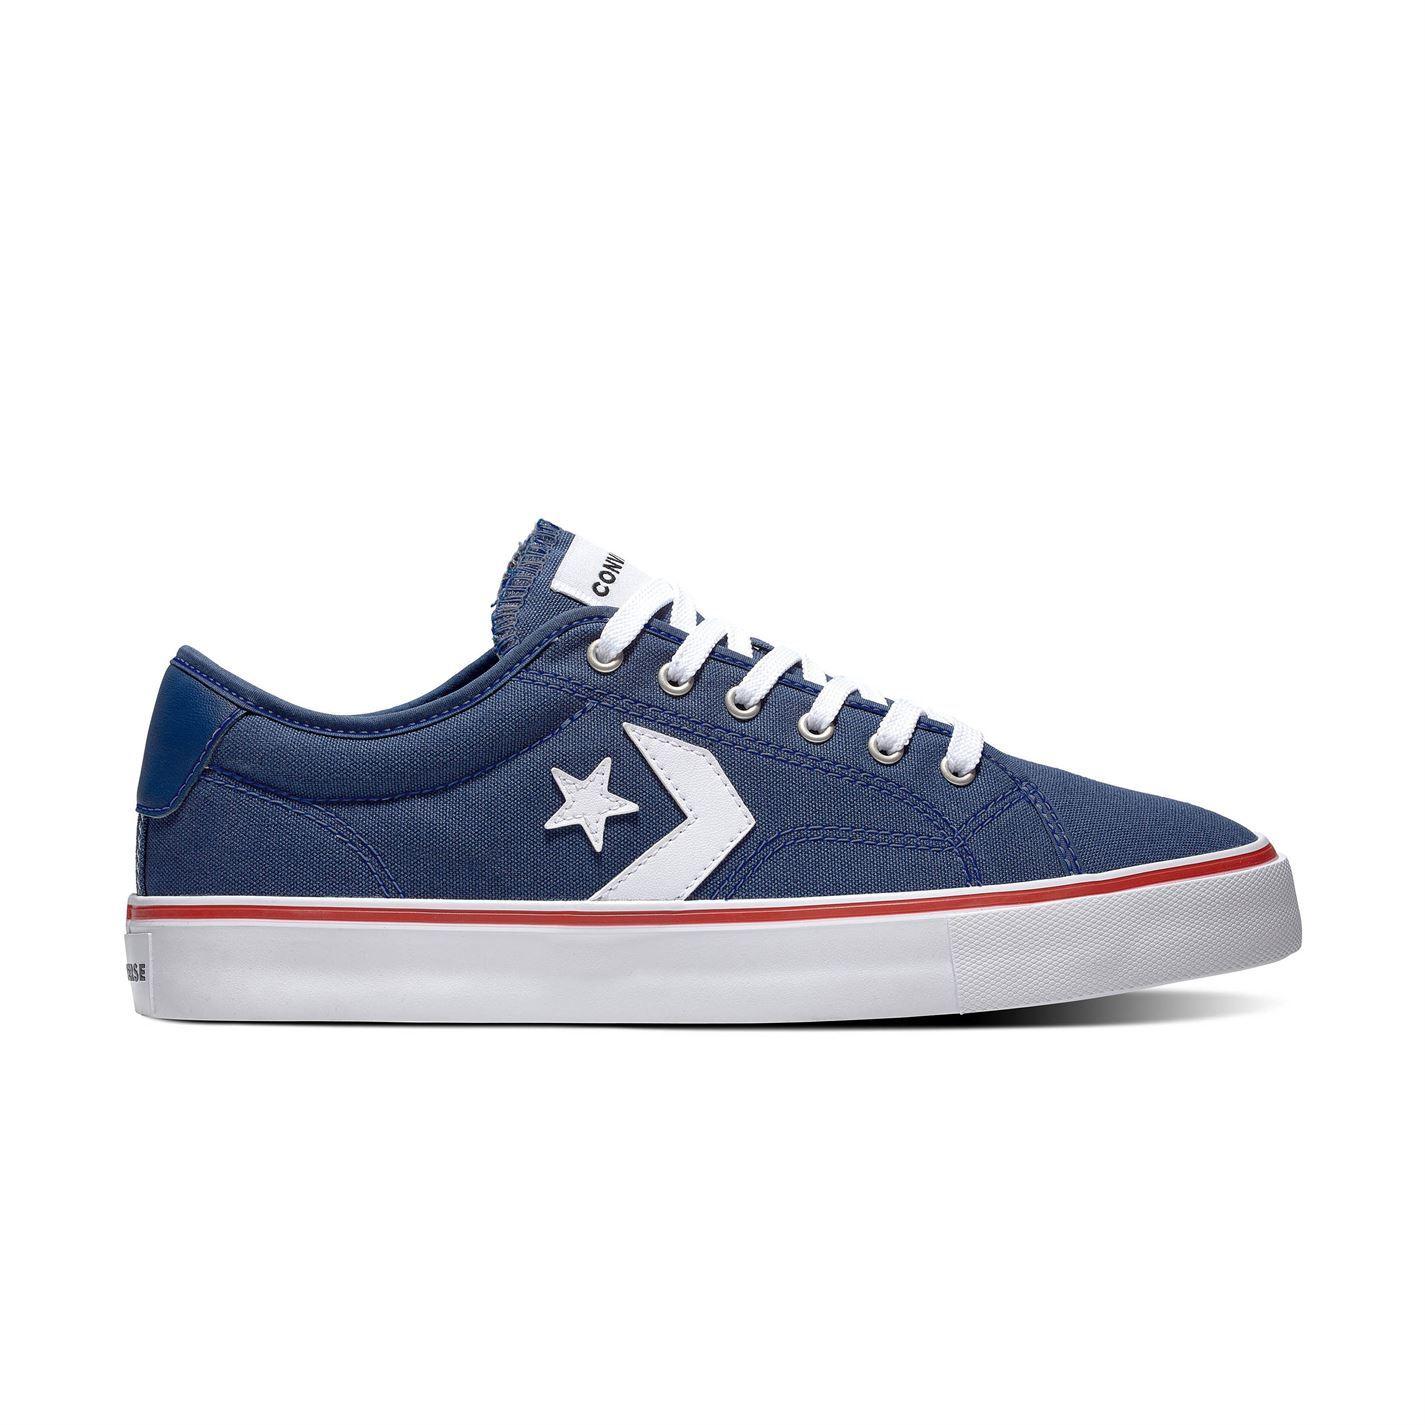 Converse-Ox-REPLAY-Baskets-Pour-Homme-Chaussures-De-Loisirs-Chaussures-Baskets miniature 18